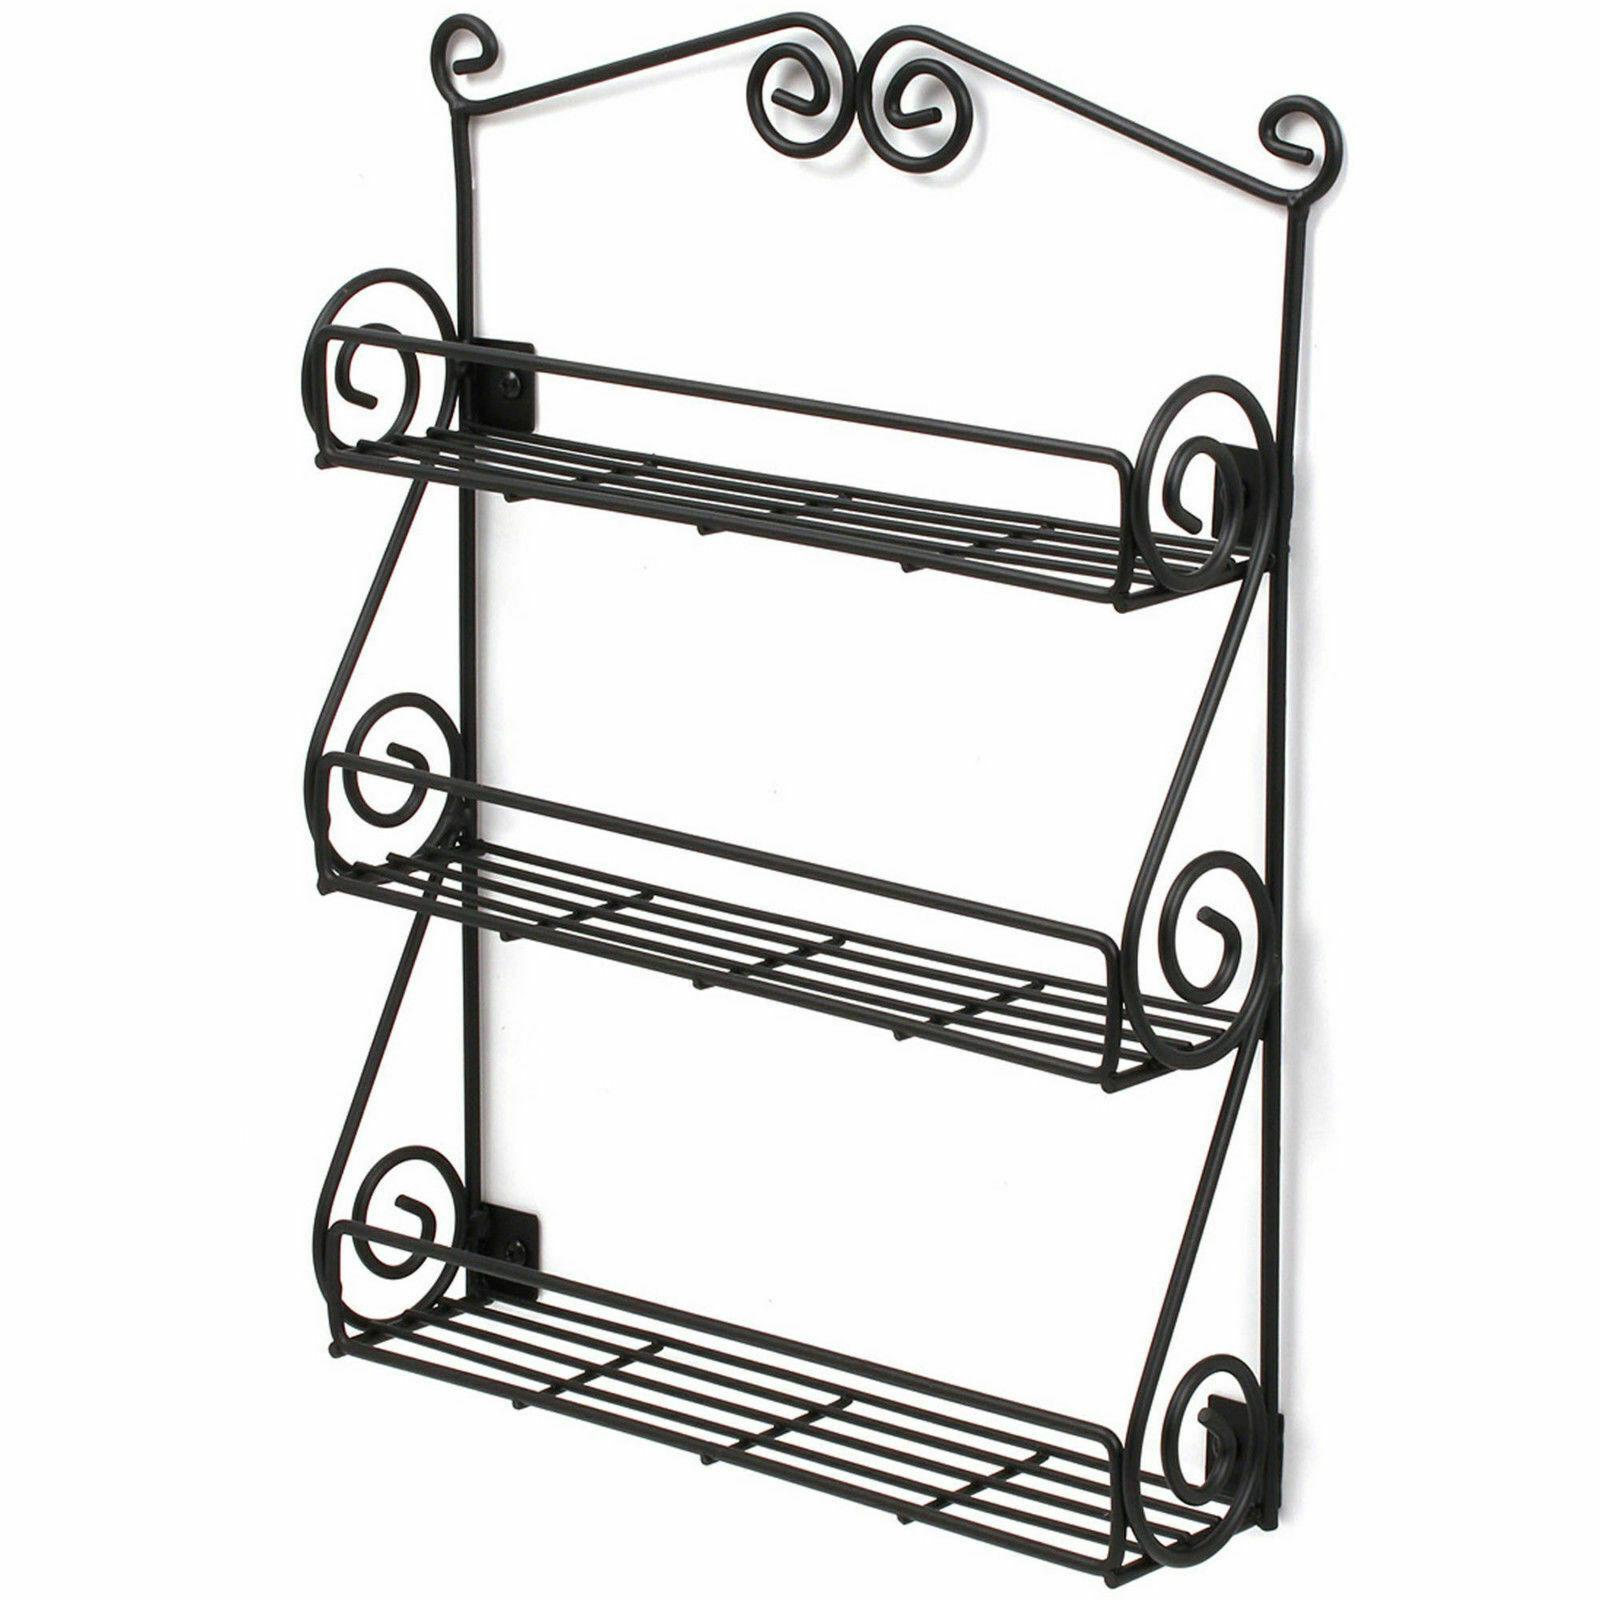 Home, Furniture & DIY New WLR01 Metal Wall Mountable Black Scroll Kitchen Spice Rack